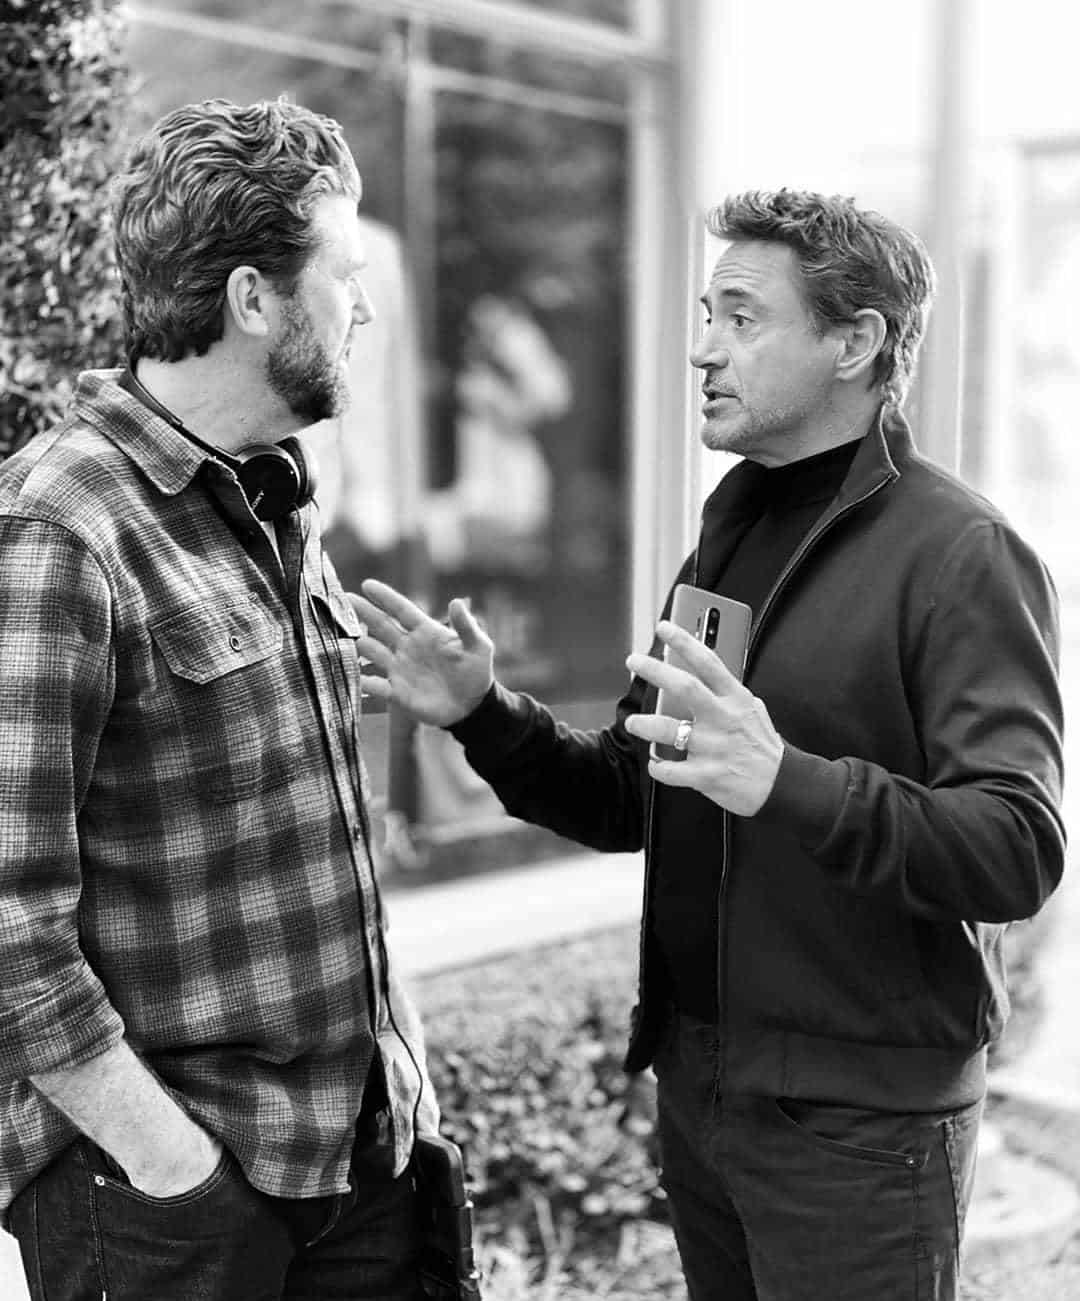 OnePlus 8 Pro Robert Downey Jr photo shoot leak 1